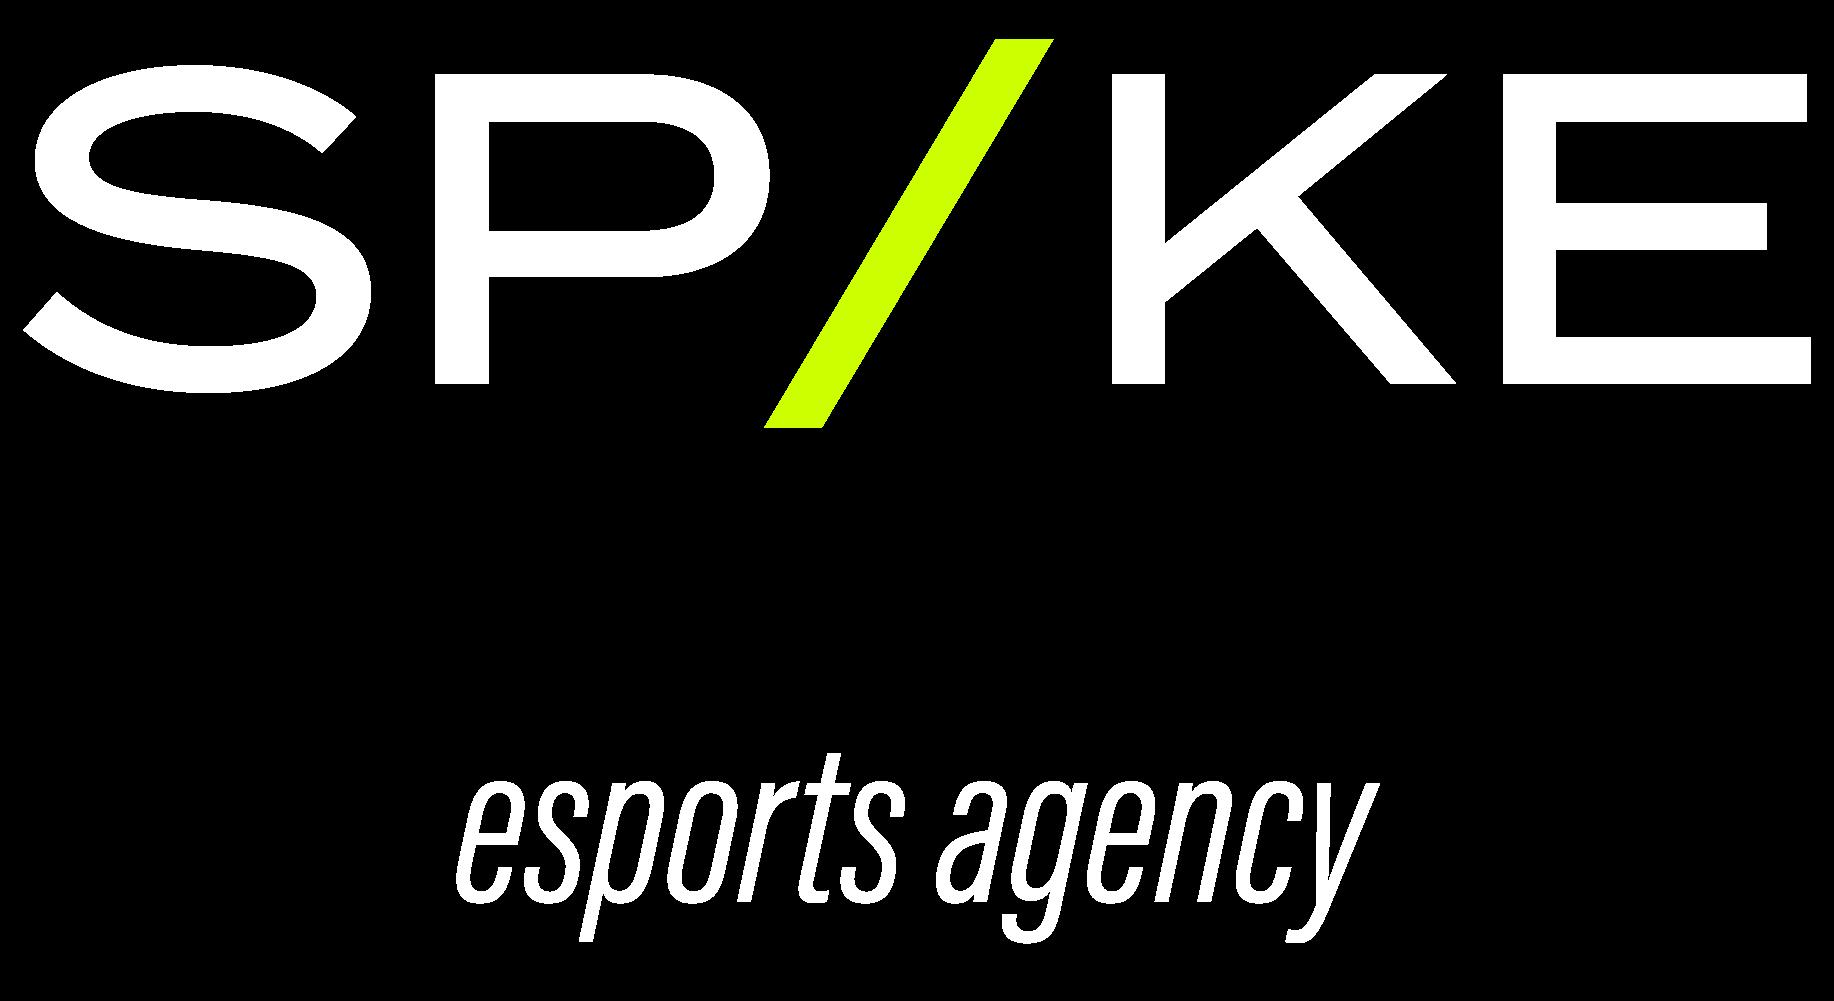 Spike Esport Agency